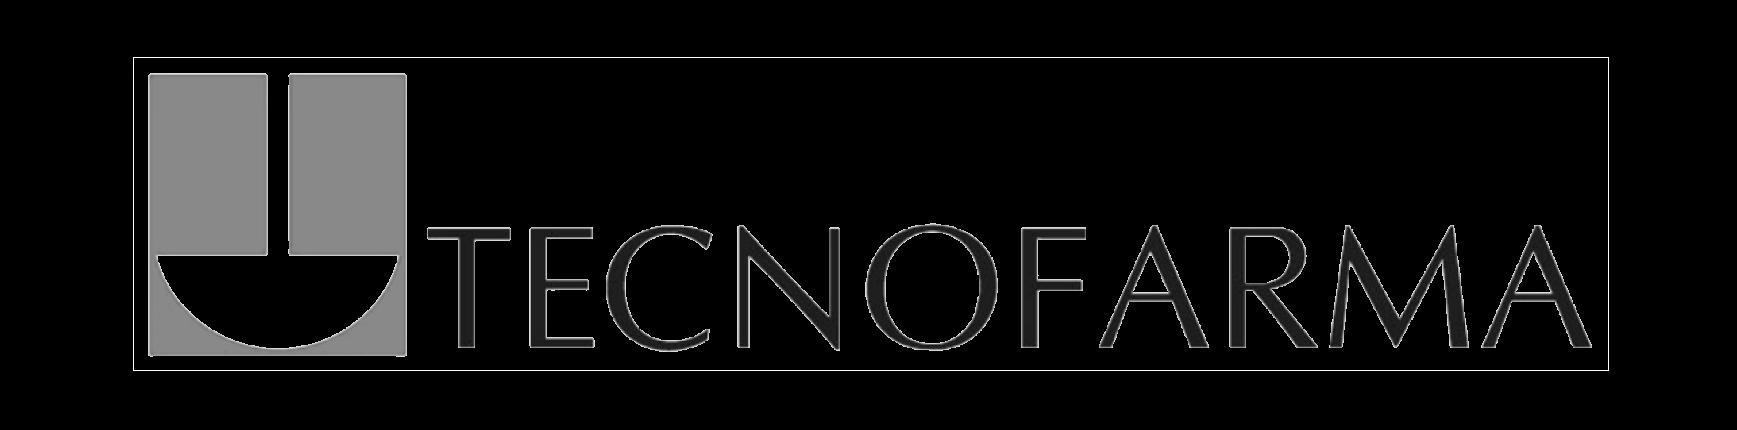 34 TECNOFARMA-logo - transparent.png